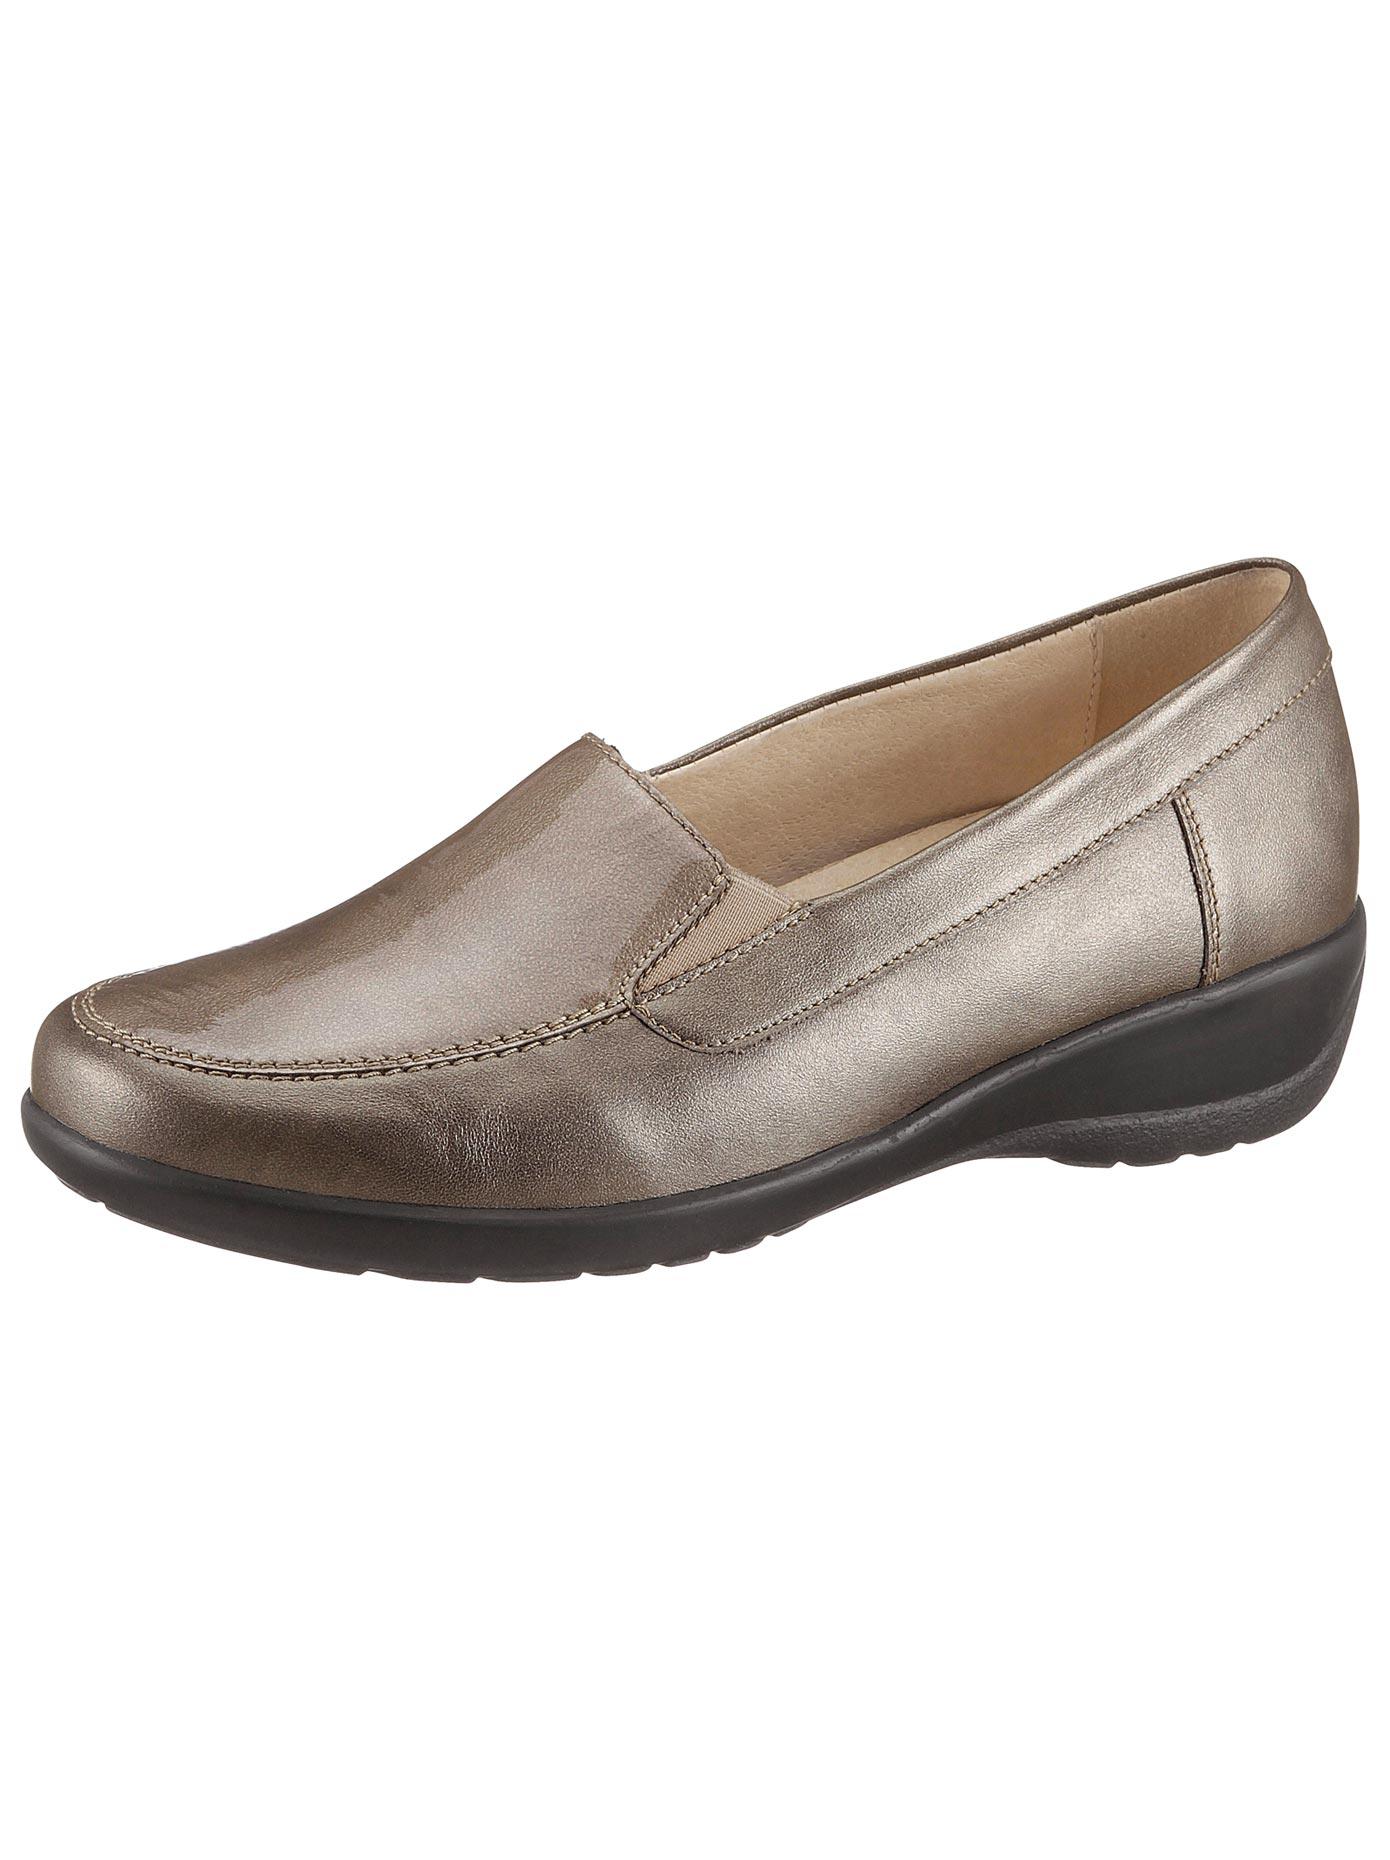 Soft Line Slipper mit rutschhemmender PU-Luftpolstersohle | Schuhe > Slipper | Leder - Pu | Soft Line